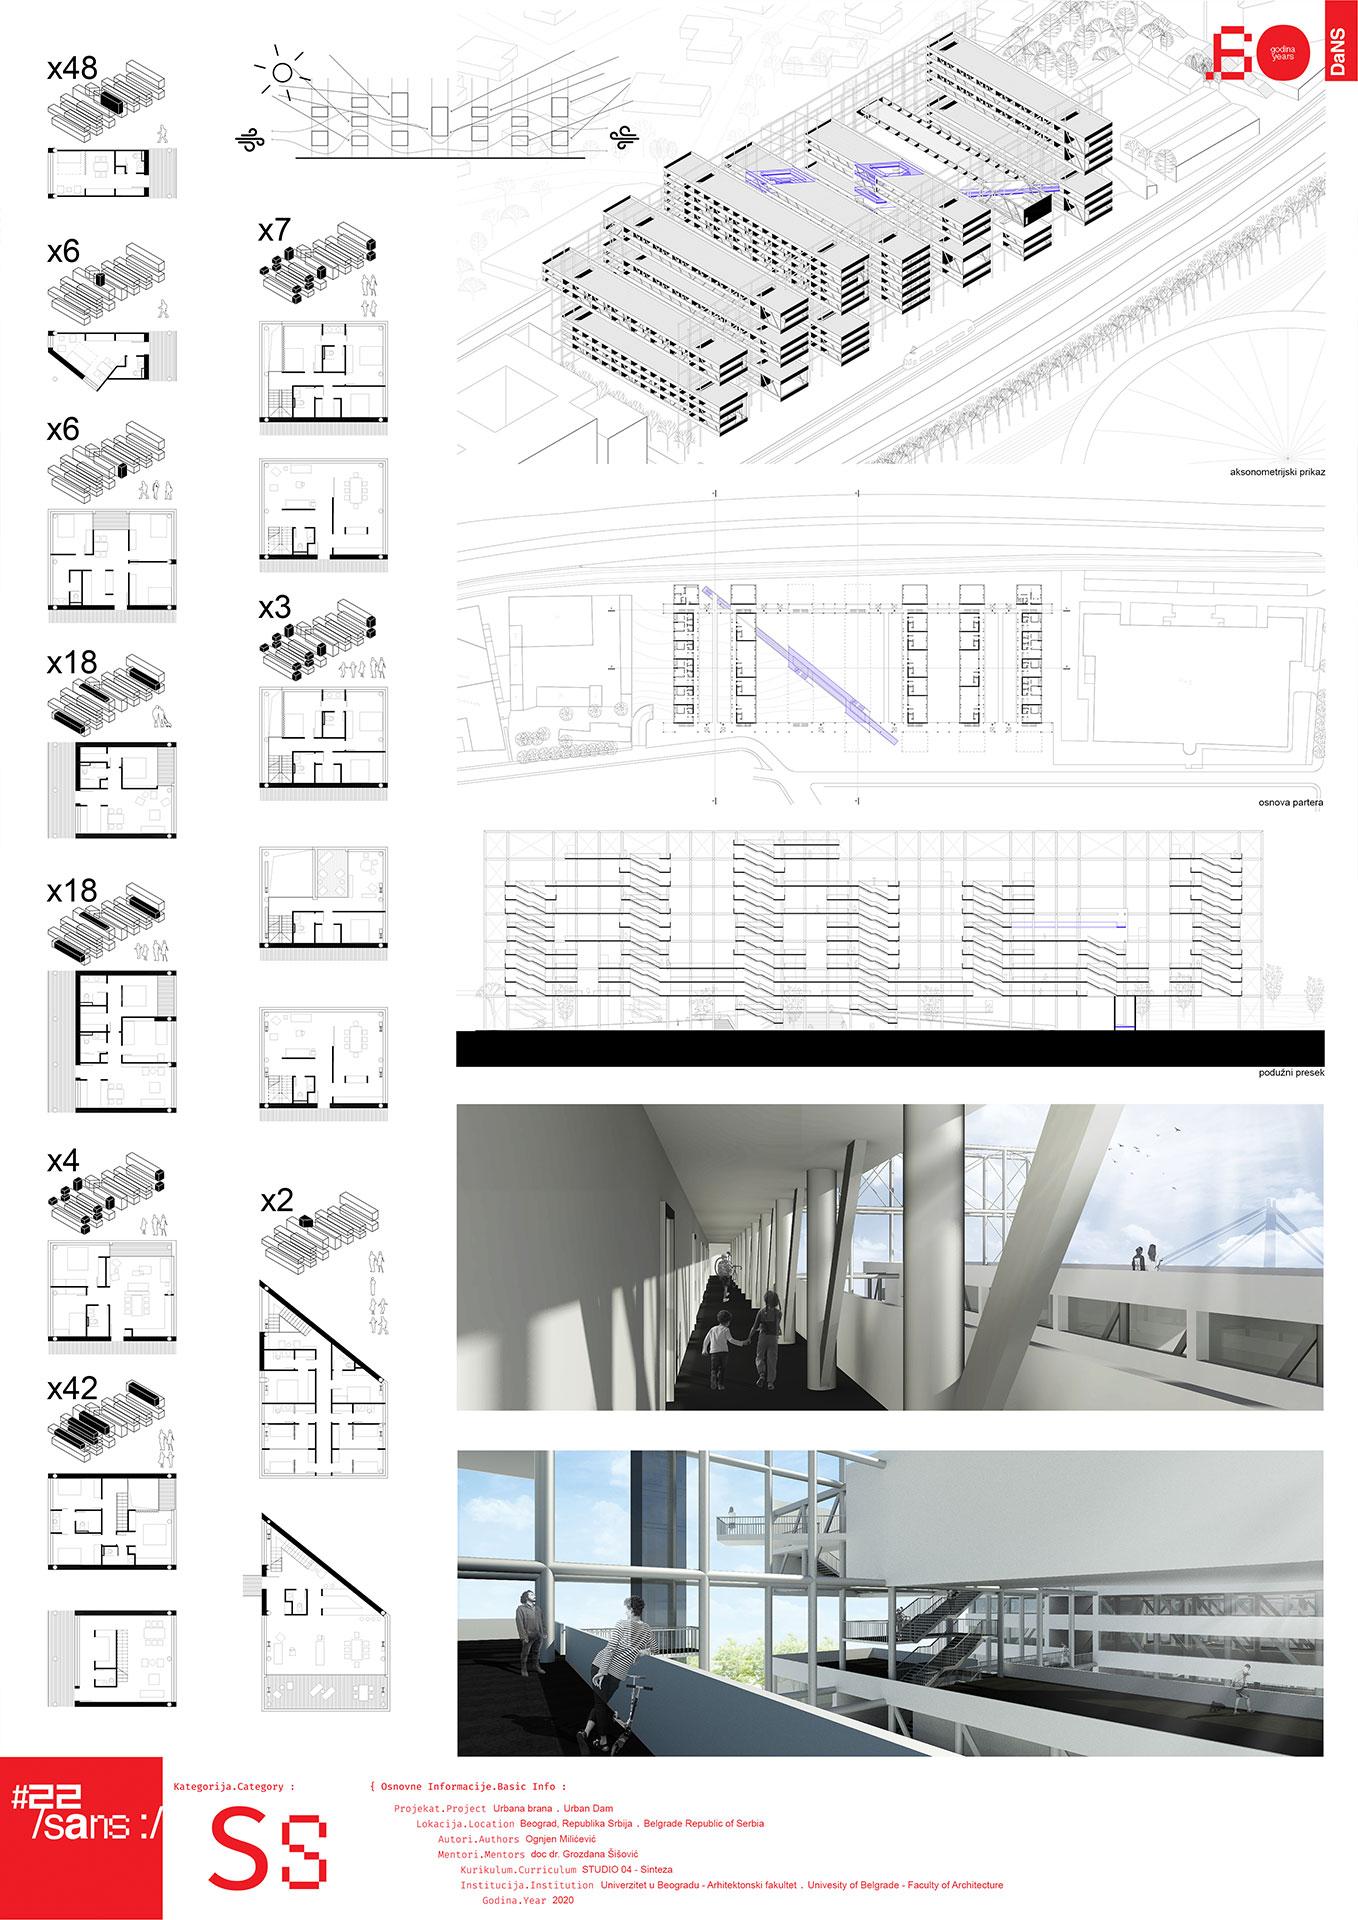 "<p class=""naslov-br"">ss50</p>Urbana brana - studio projekat 4 // Urban Dam - Studio project 4"